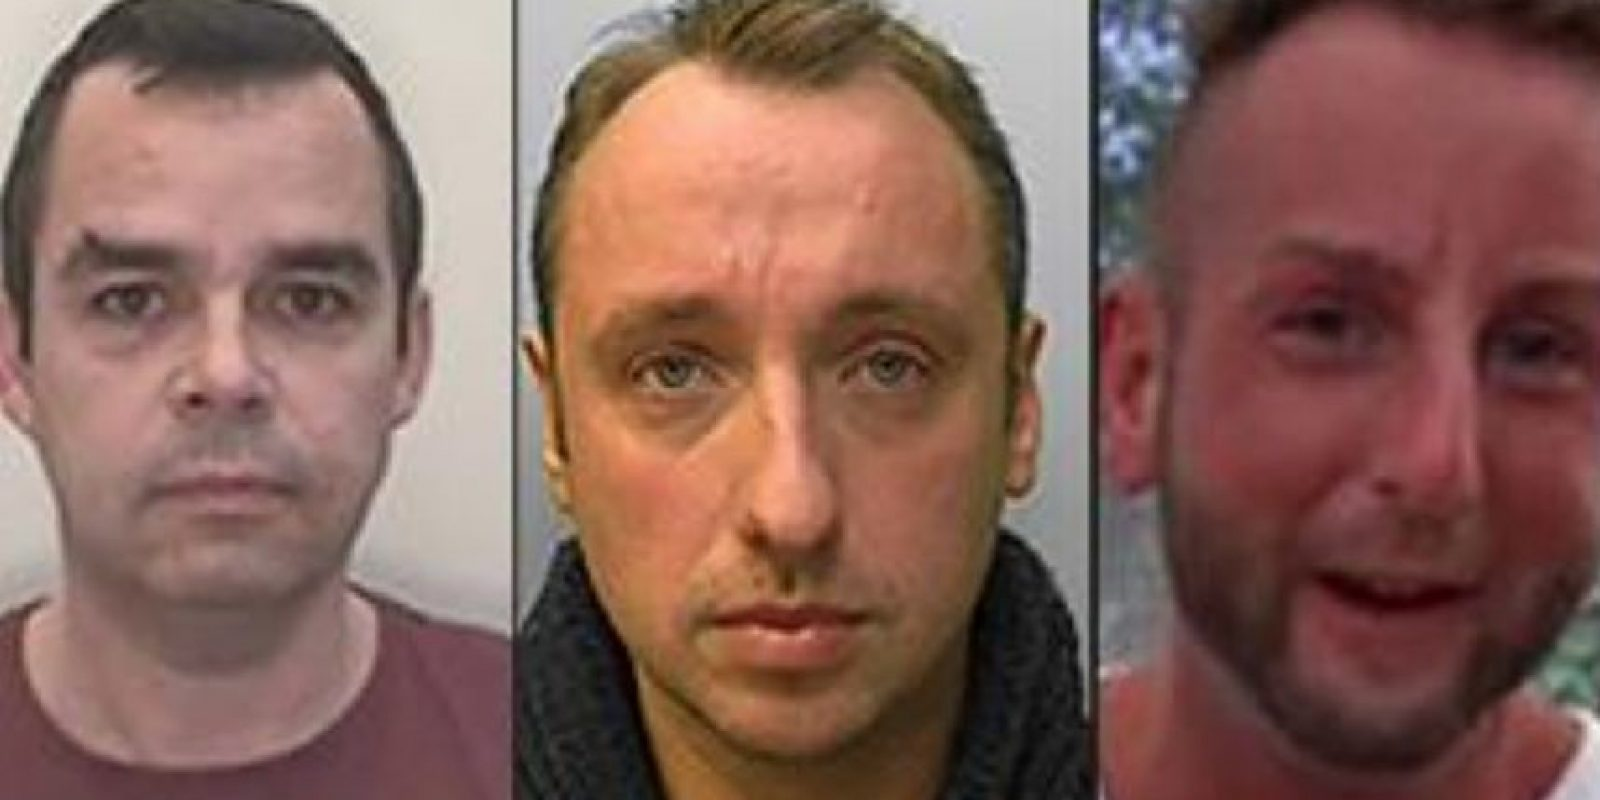 De izquierda a derecha: John Denham 49, Matthew Lisk 32 y Adam Toms 33 Foto:Vía www.nationalcrimeagency.gov.uk